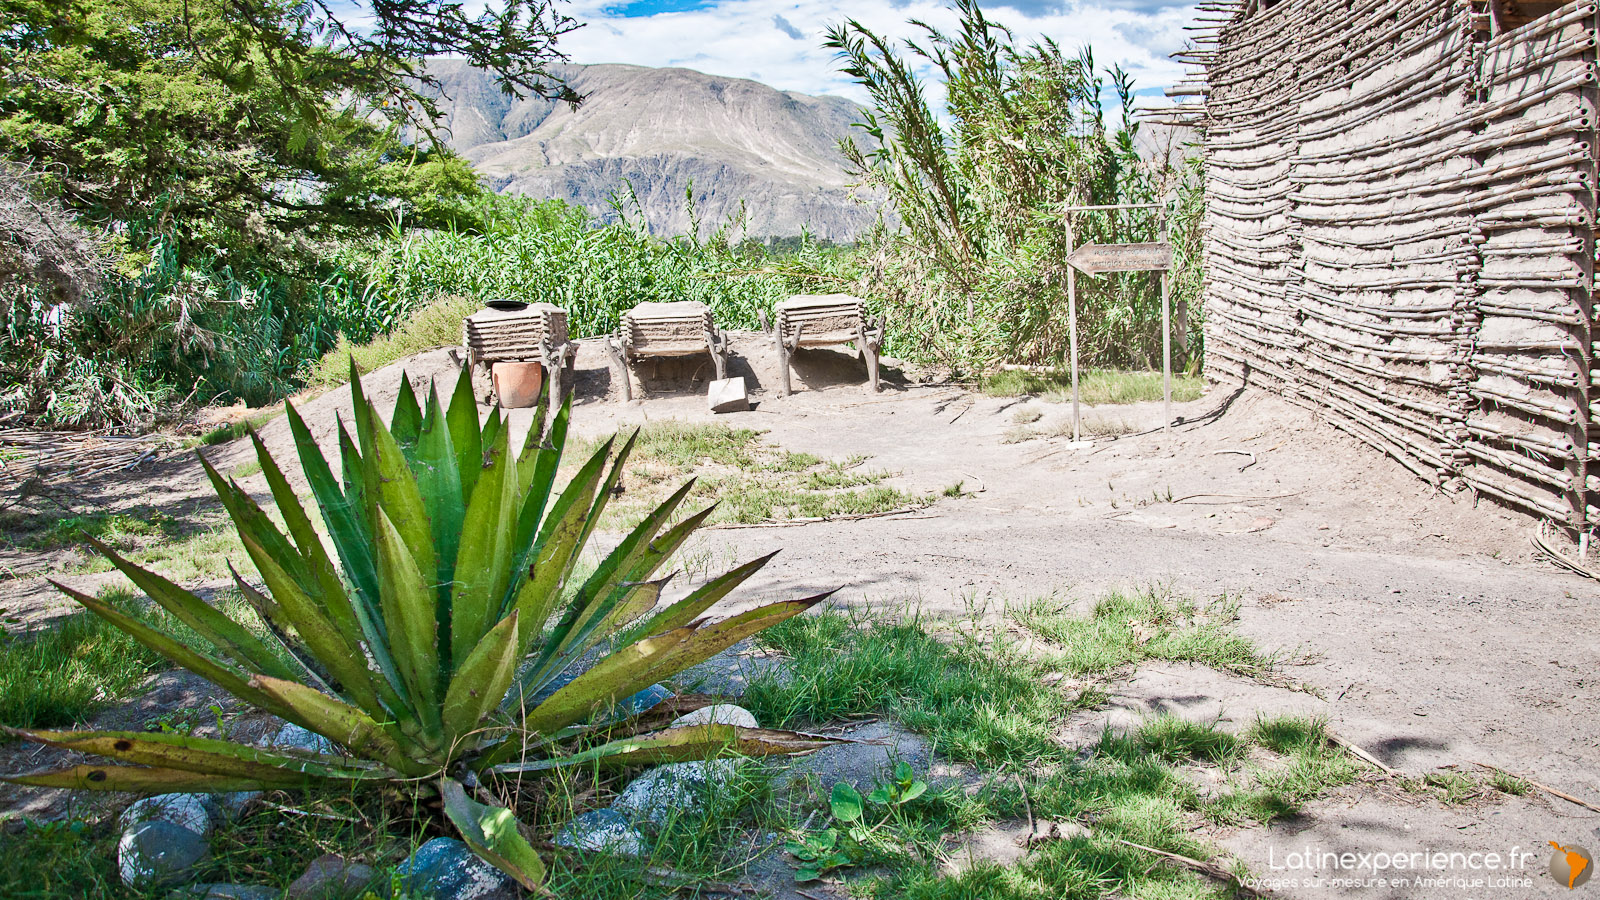 Equateur - Salinas  - Latinexperience voyages